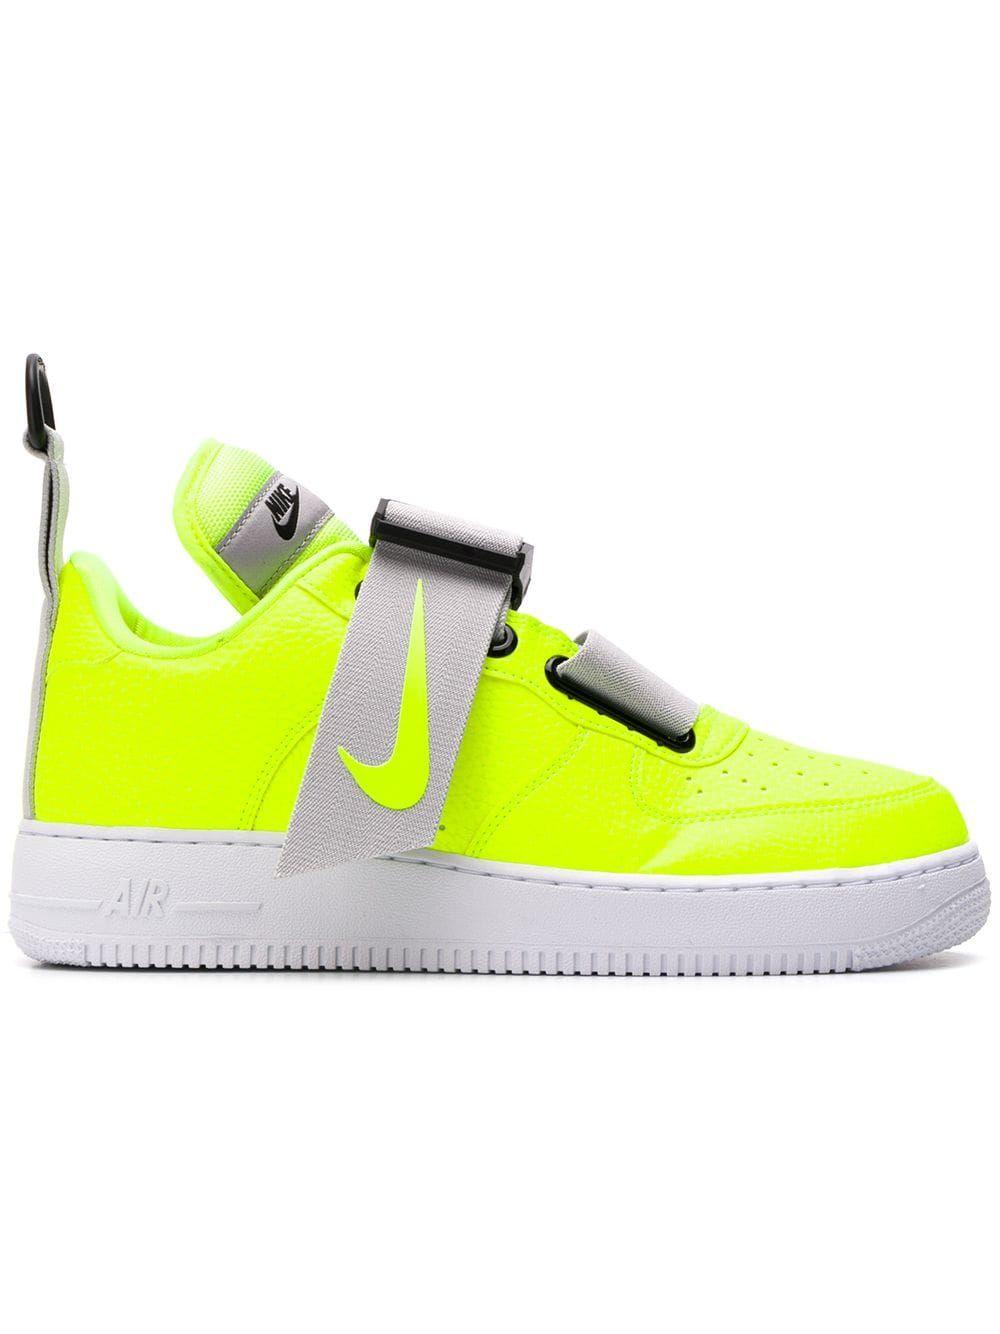 Nike Men's Air Force 1 Utility Casual